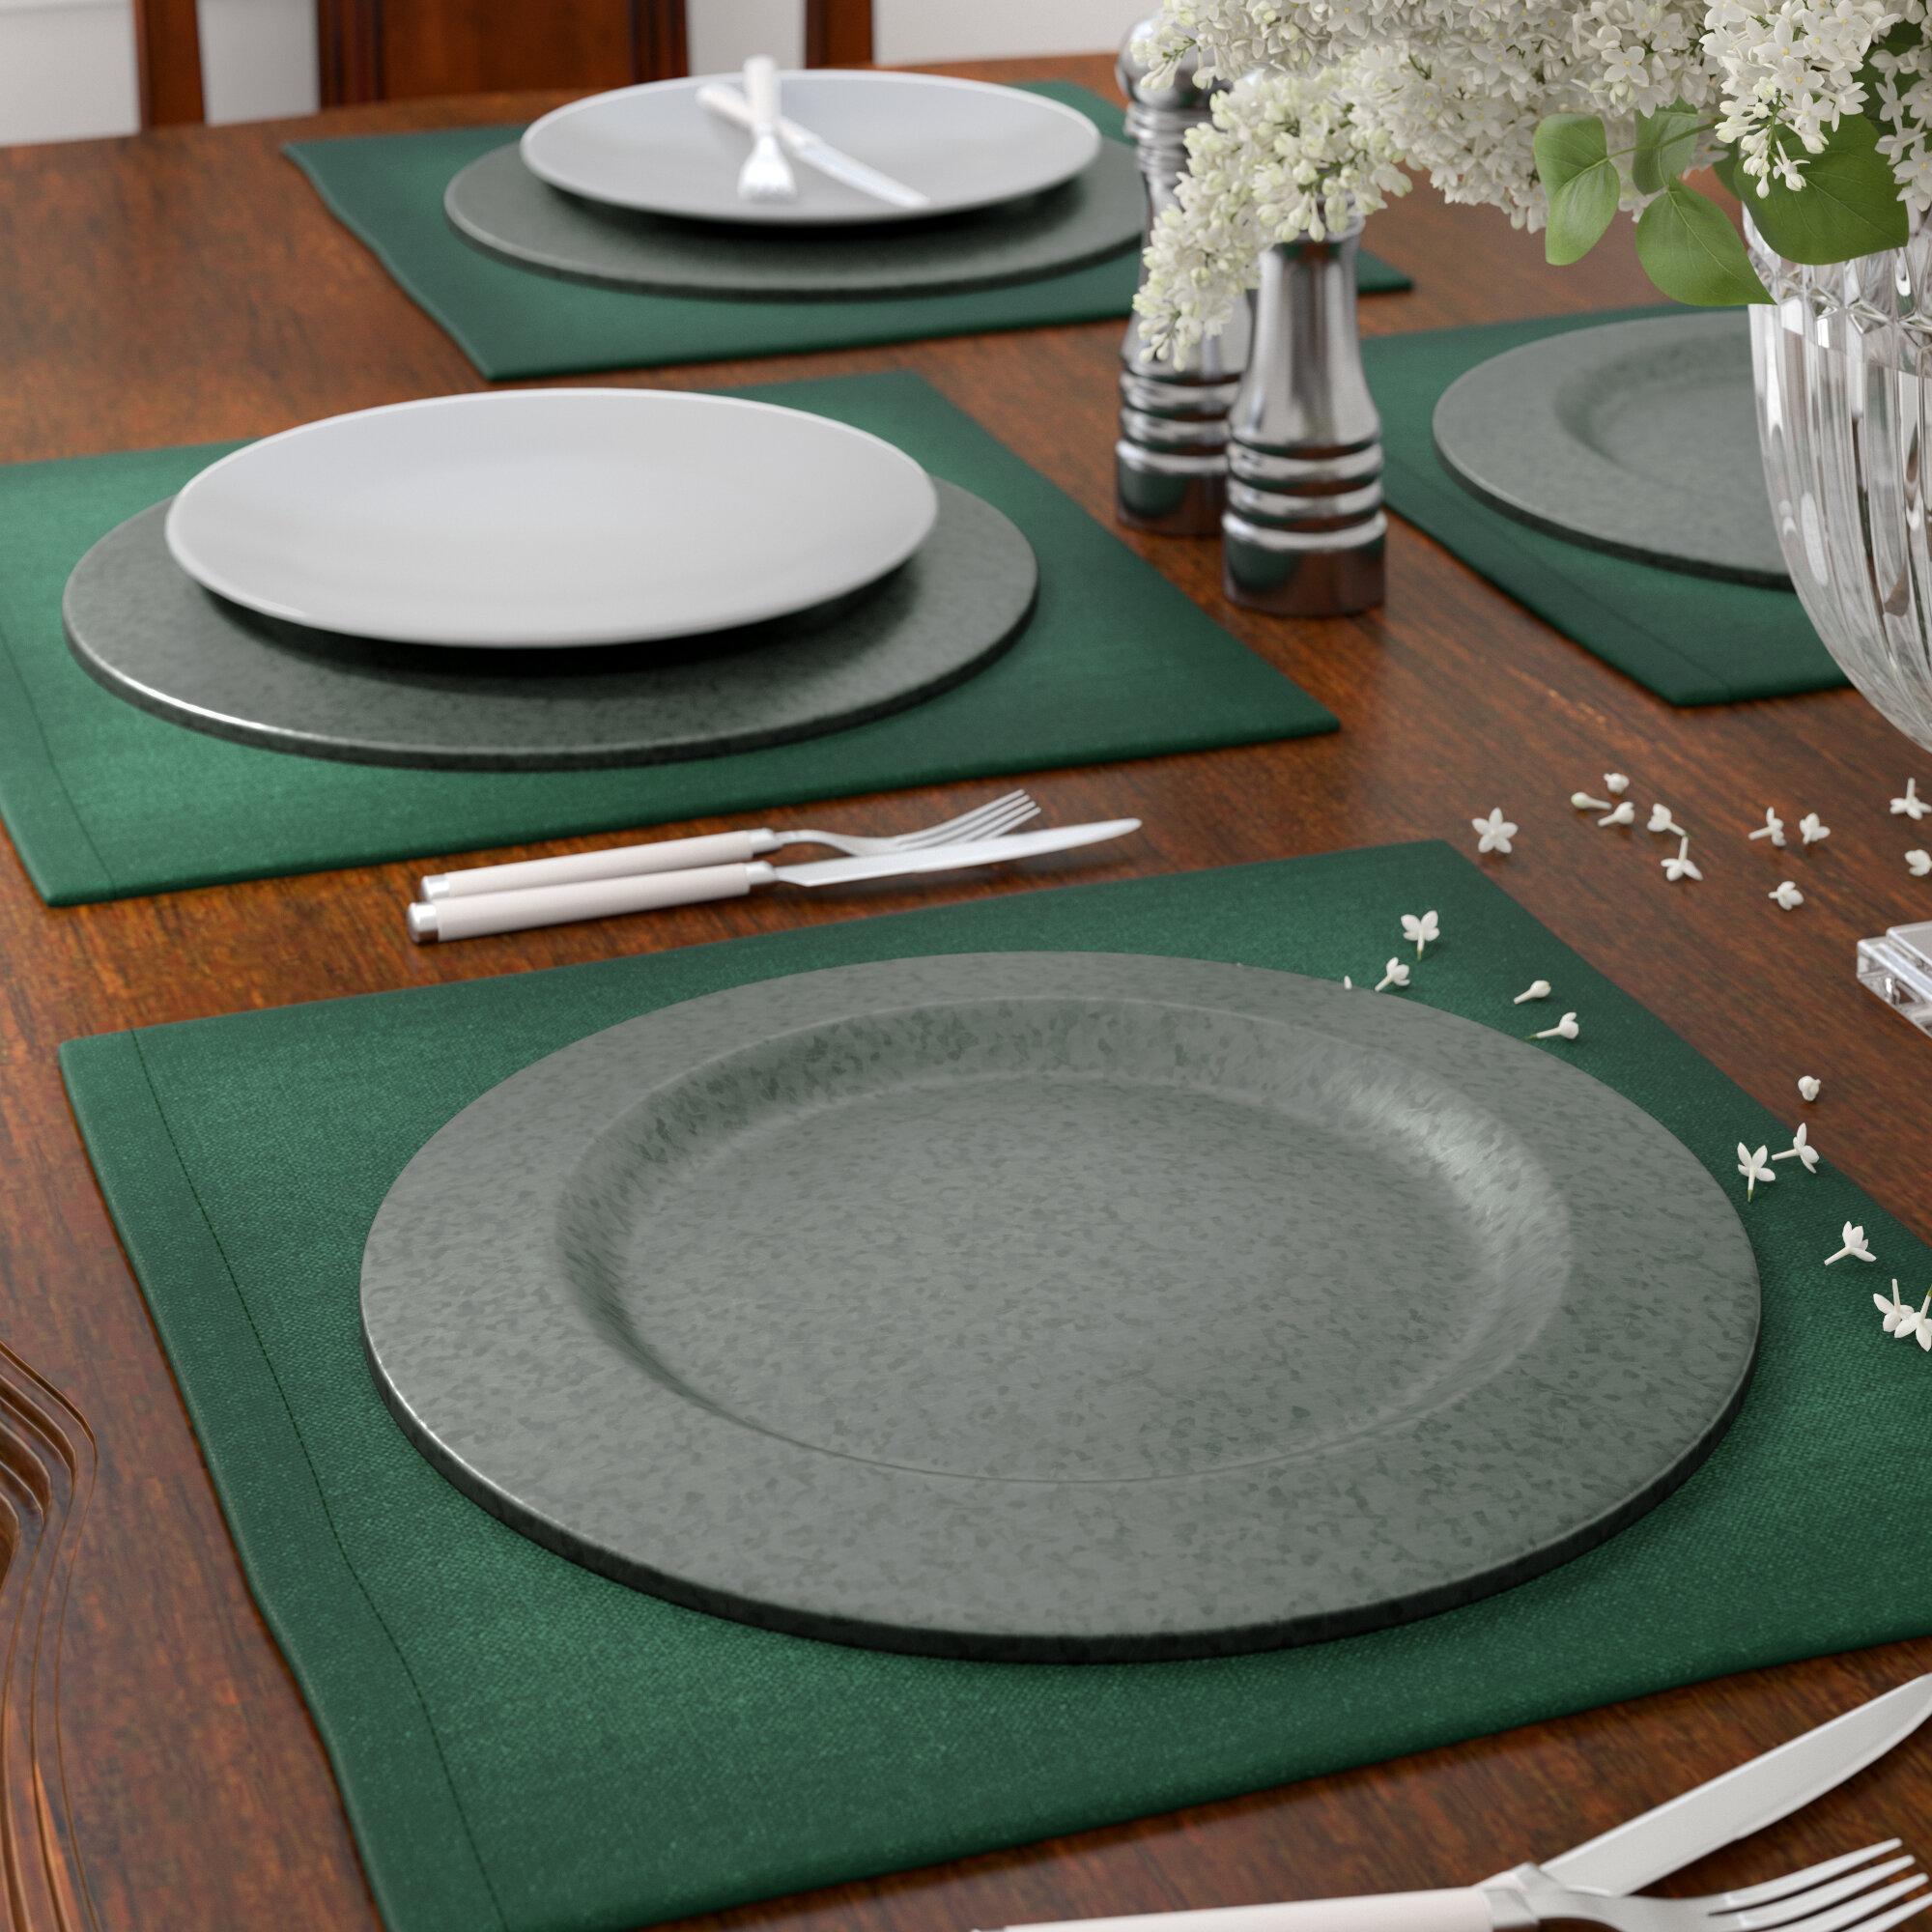 Josh Galvanized Charger Plate Set